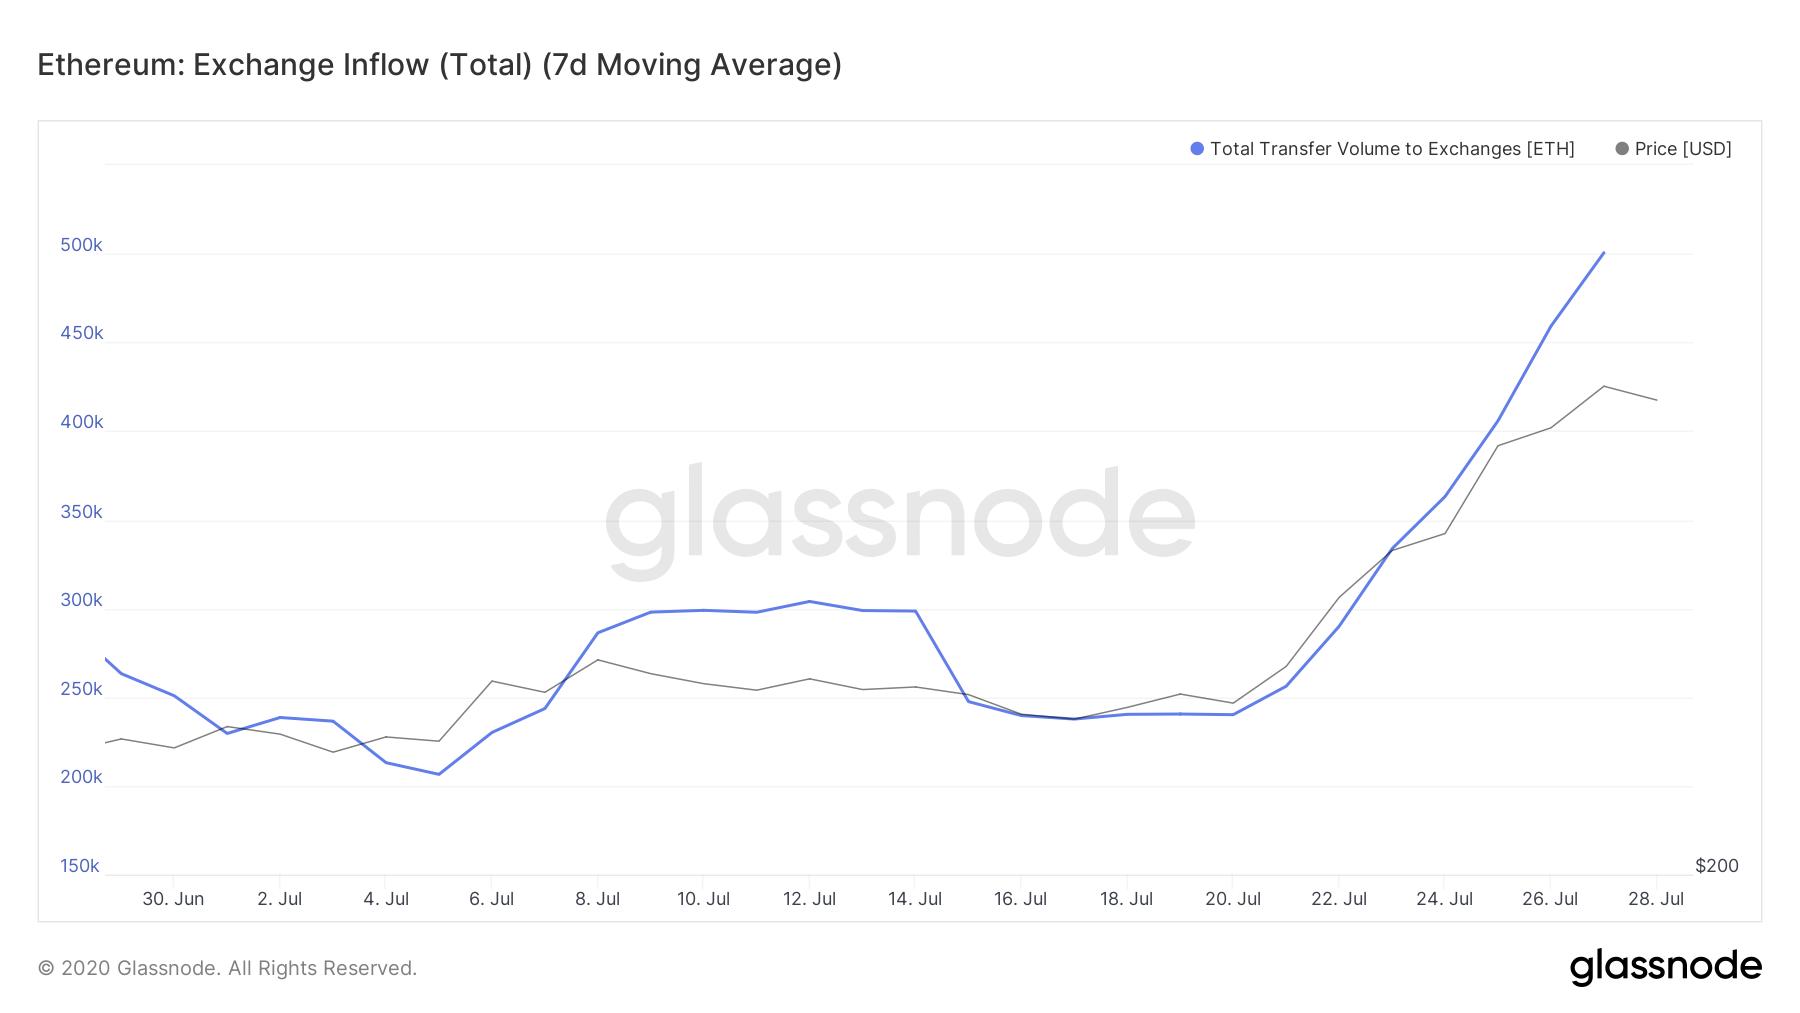 Ethereum's Exchange Inflow by Glassnode